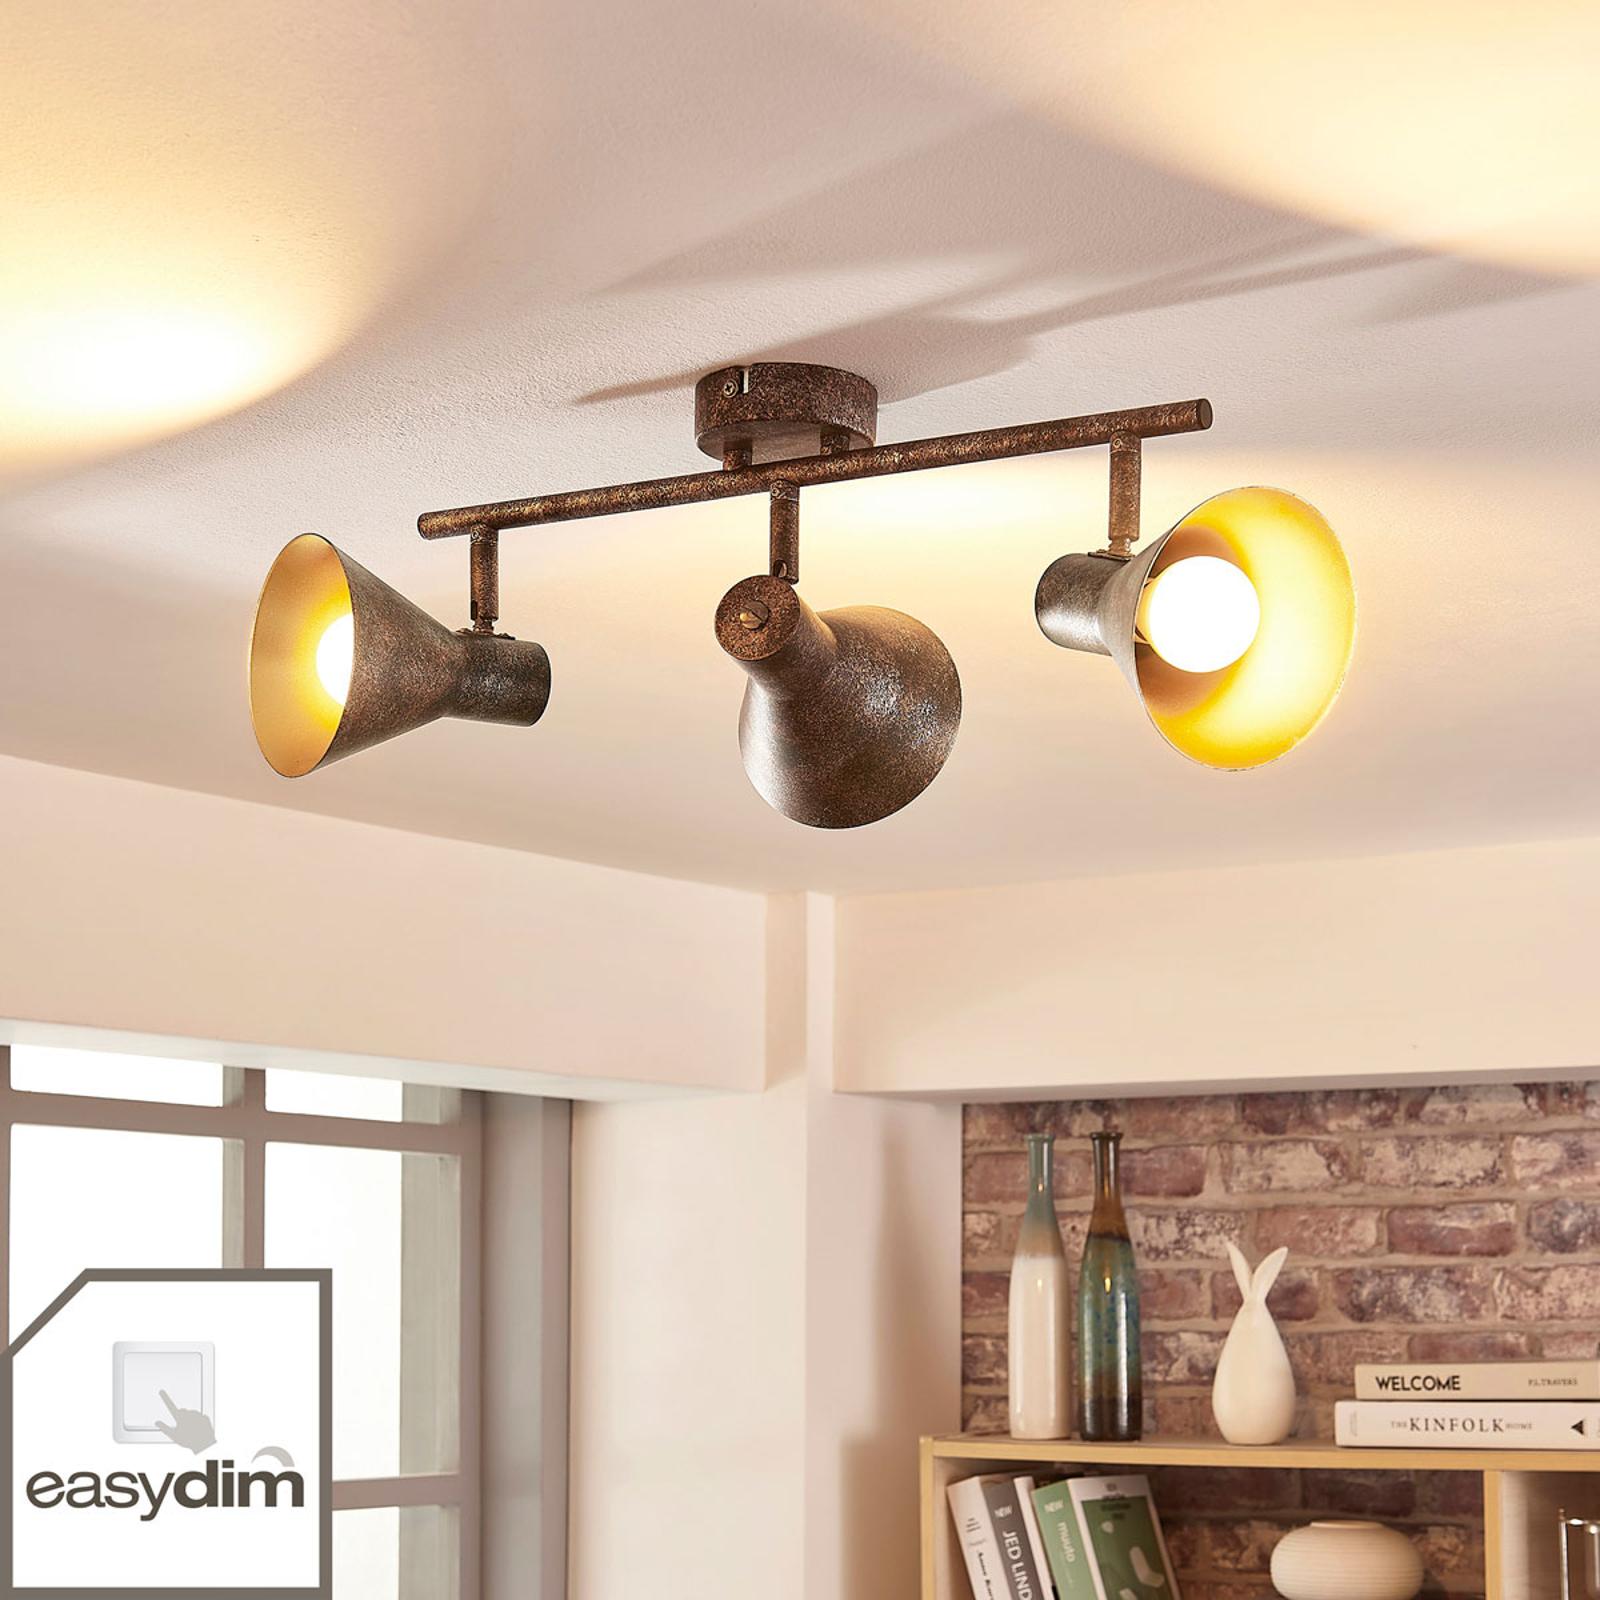 Zera - avlång LED-taklampa med Easydim-lampor